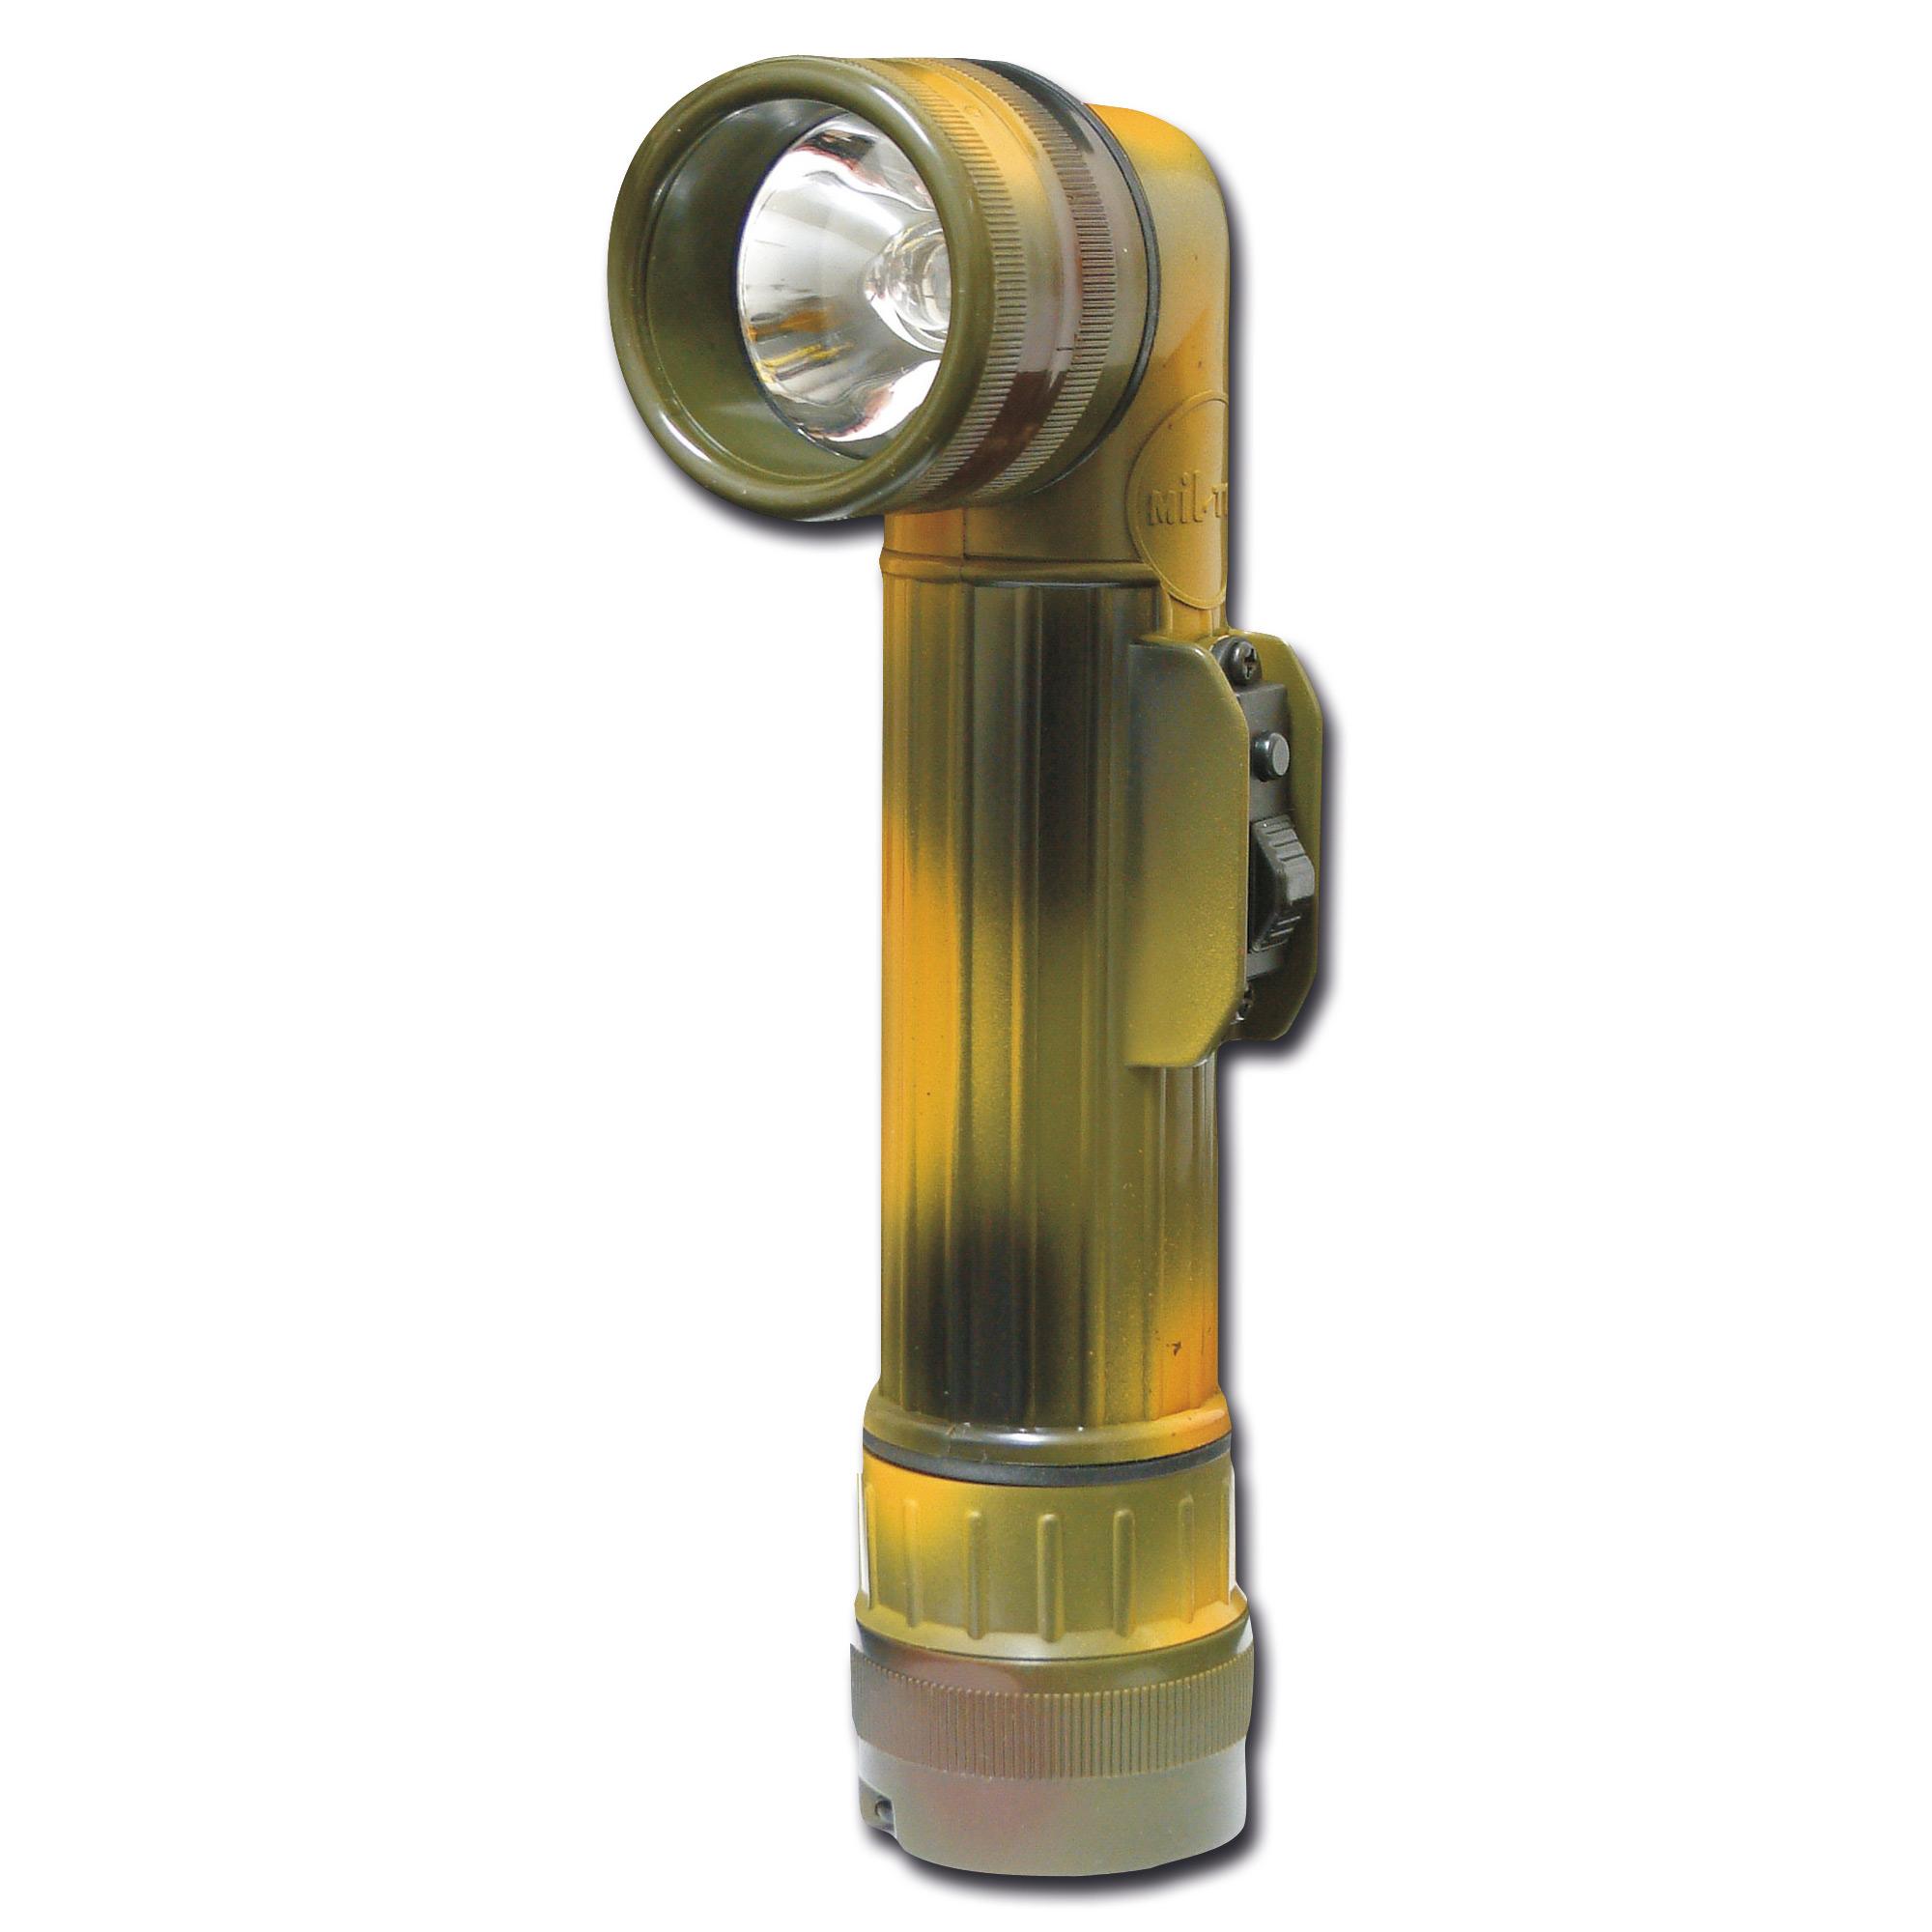 Winkellampe Import gross tarn